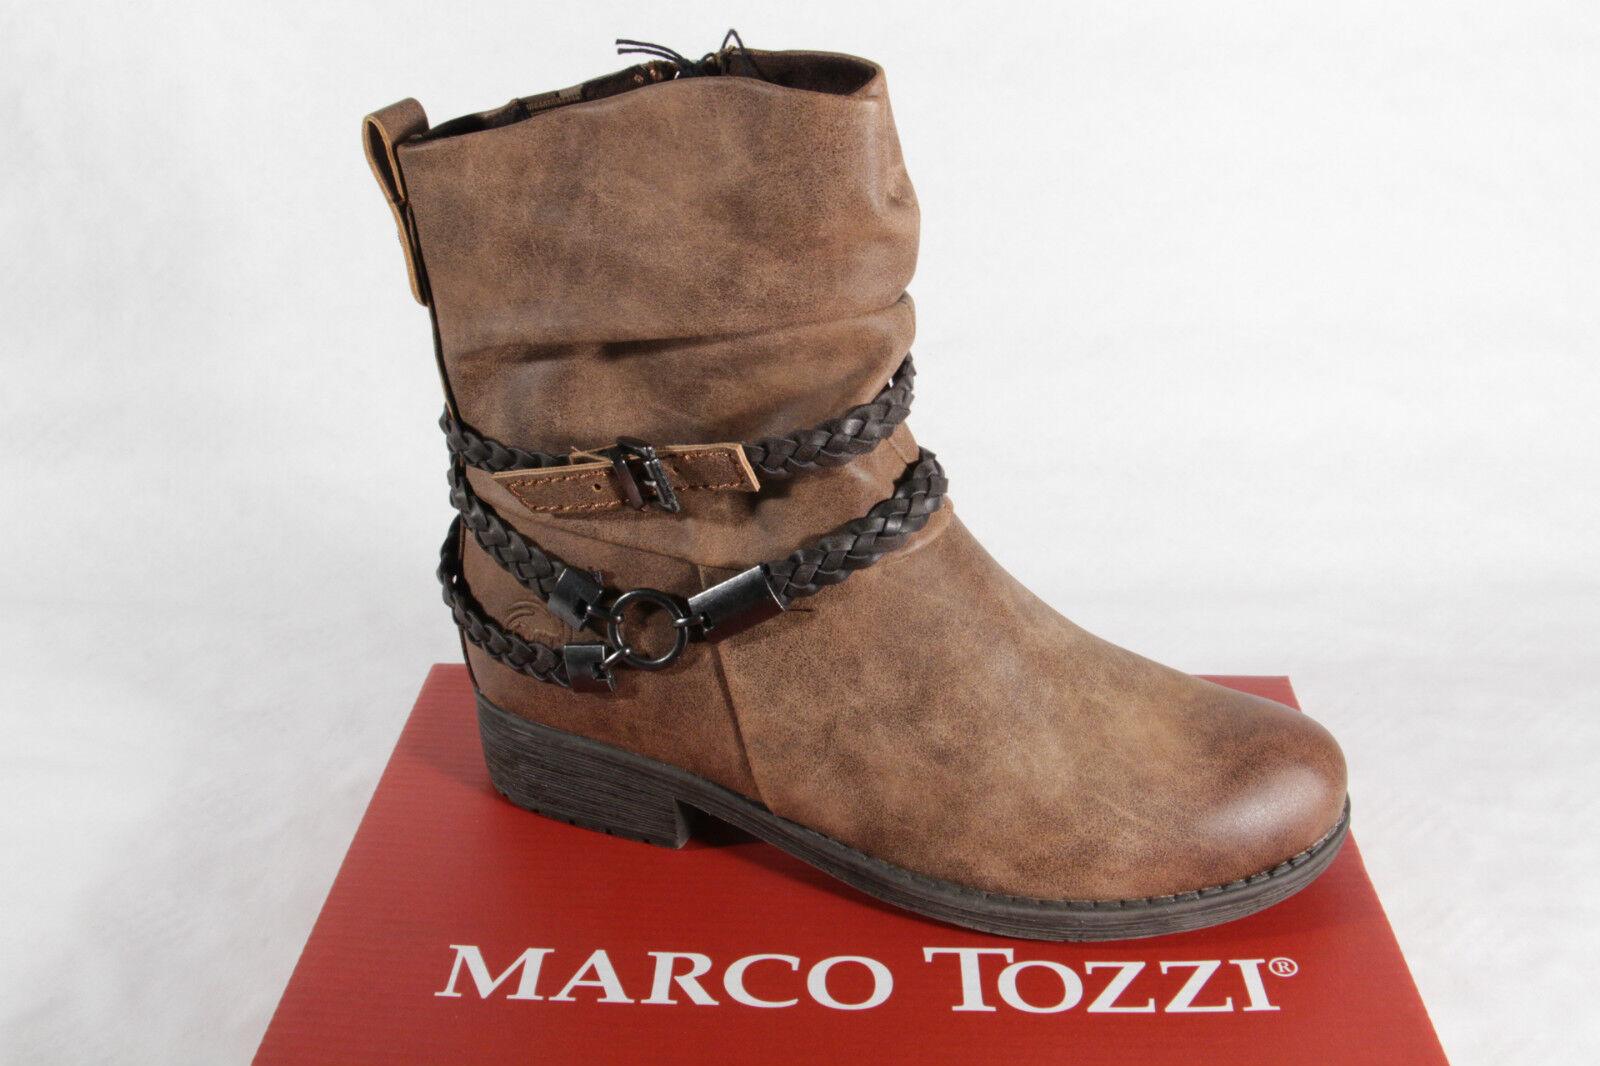 Marco Tozzi Stiefel, Stiefel, braun, gefüttert, RV 46404 NEU